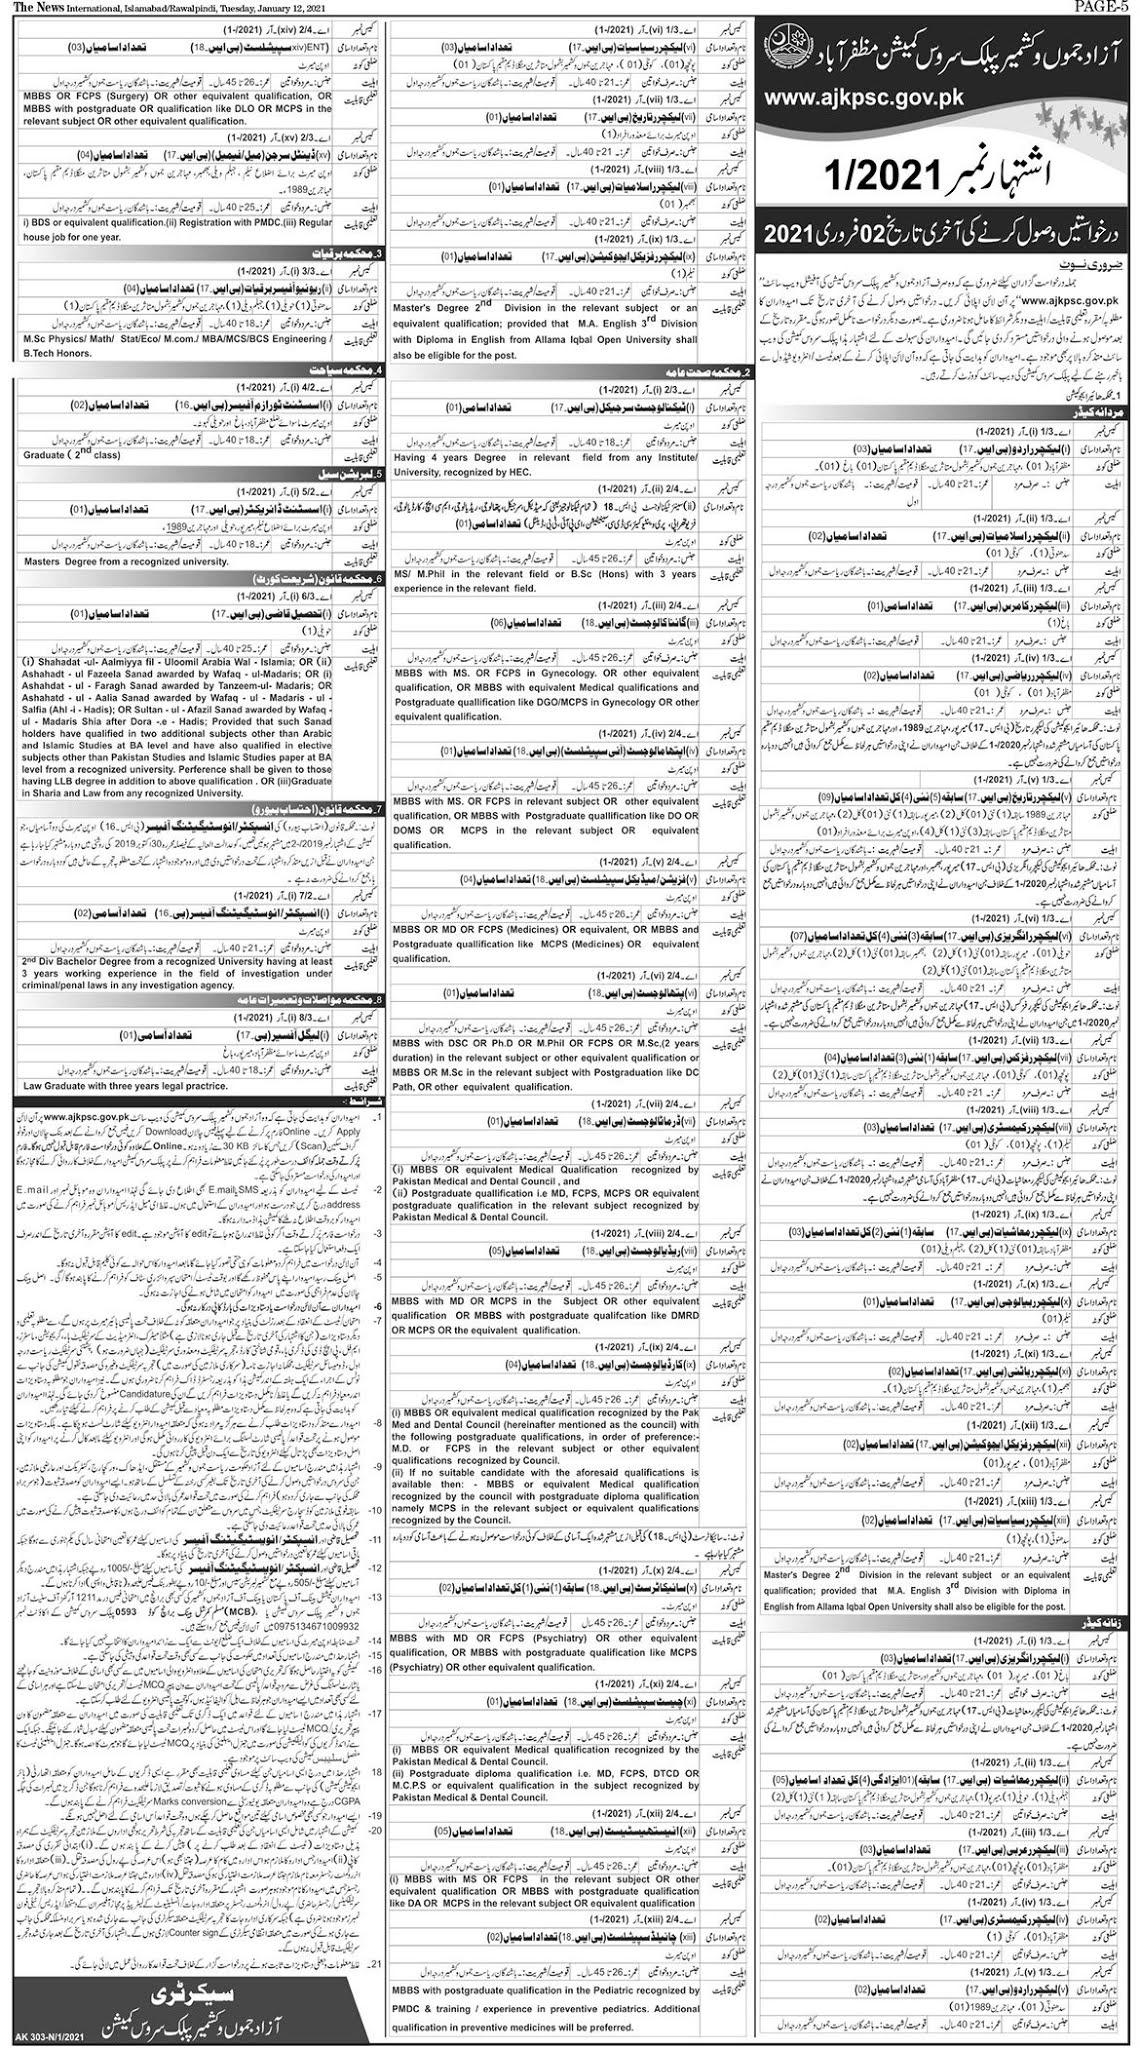 AJKPSC Jobs 2021 - Azad Jammu And Kashmir Public Service Commission Jobs 2021 - Online Application Form - www.ajkpsc.gov.pk